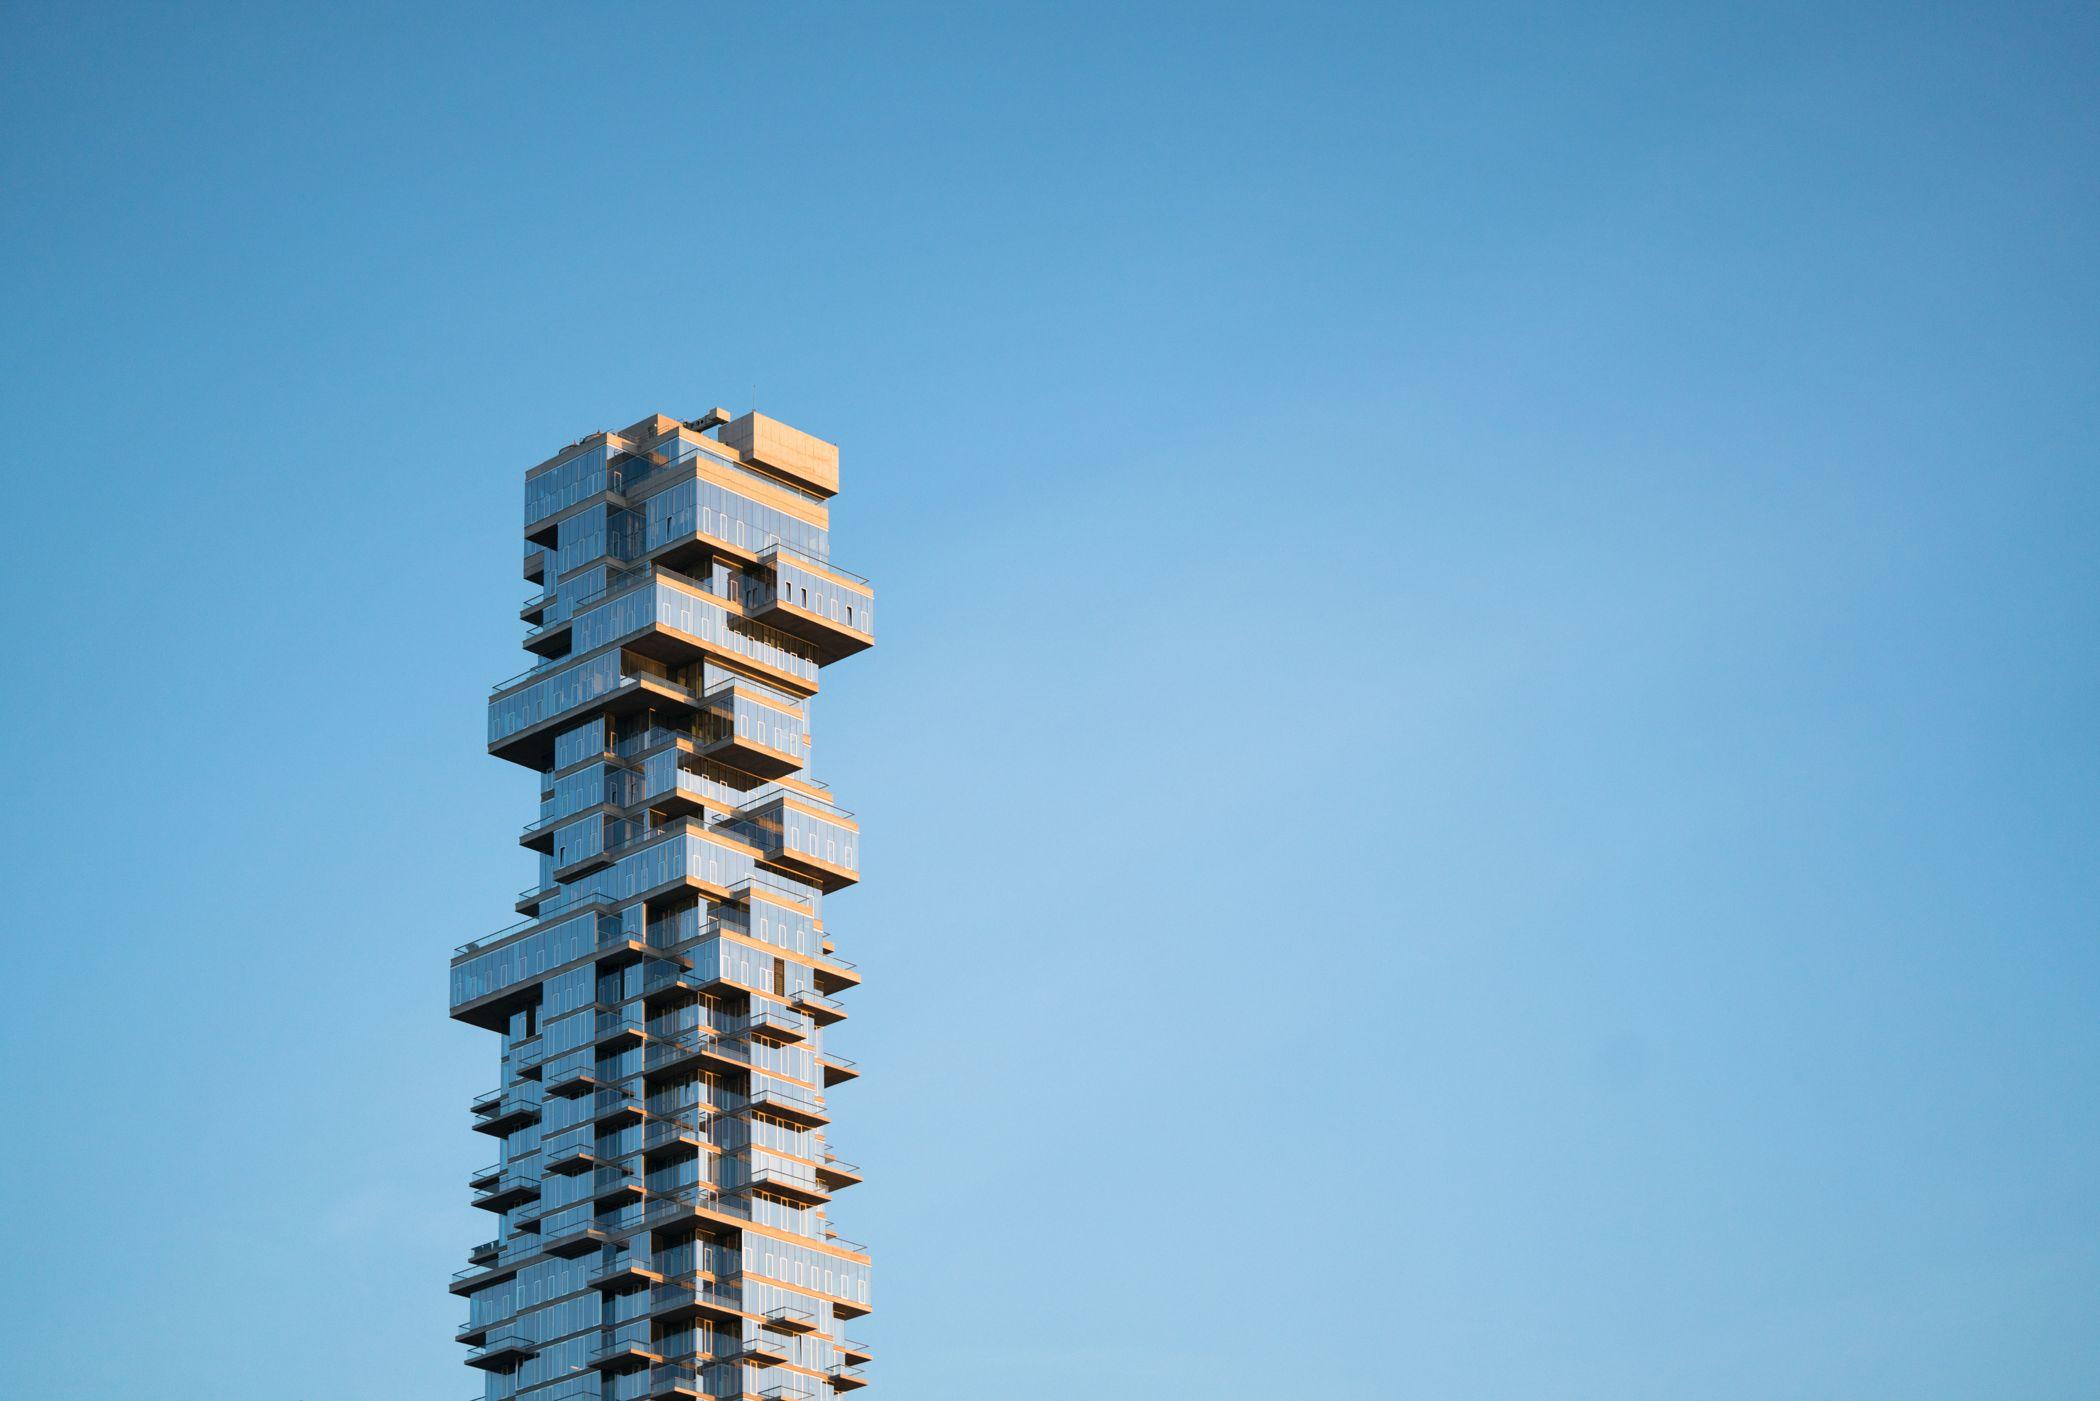 Urban design, Sky, Building, Tower, Cloud, Plant, Rectangle, Tree